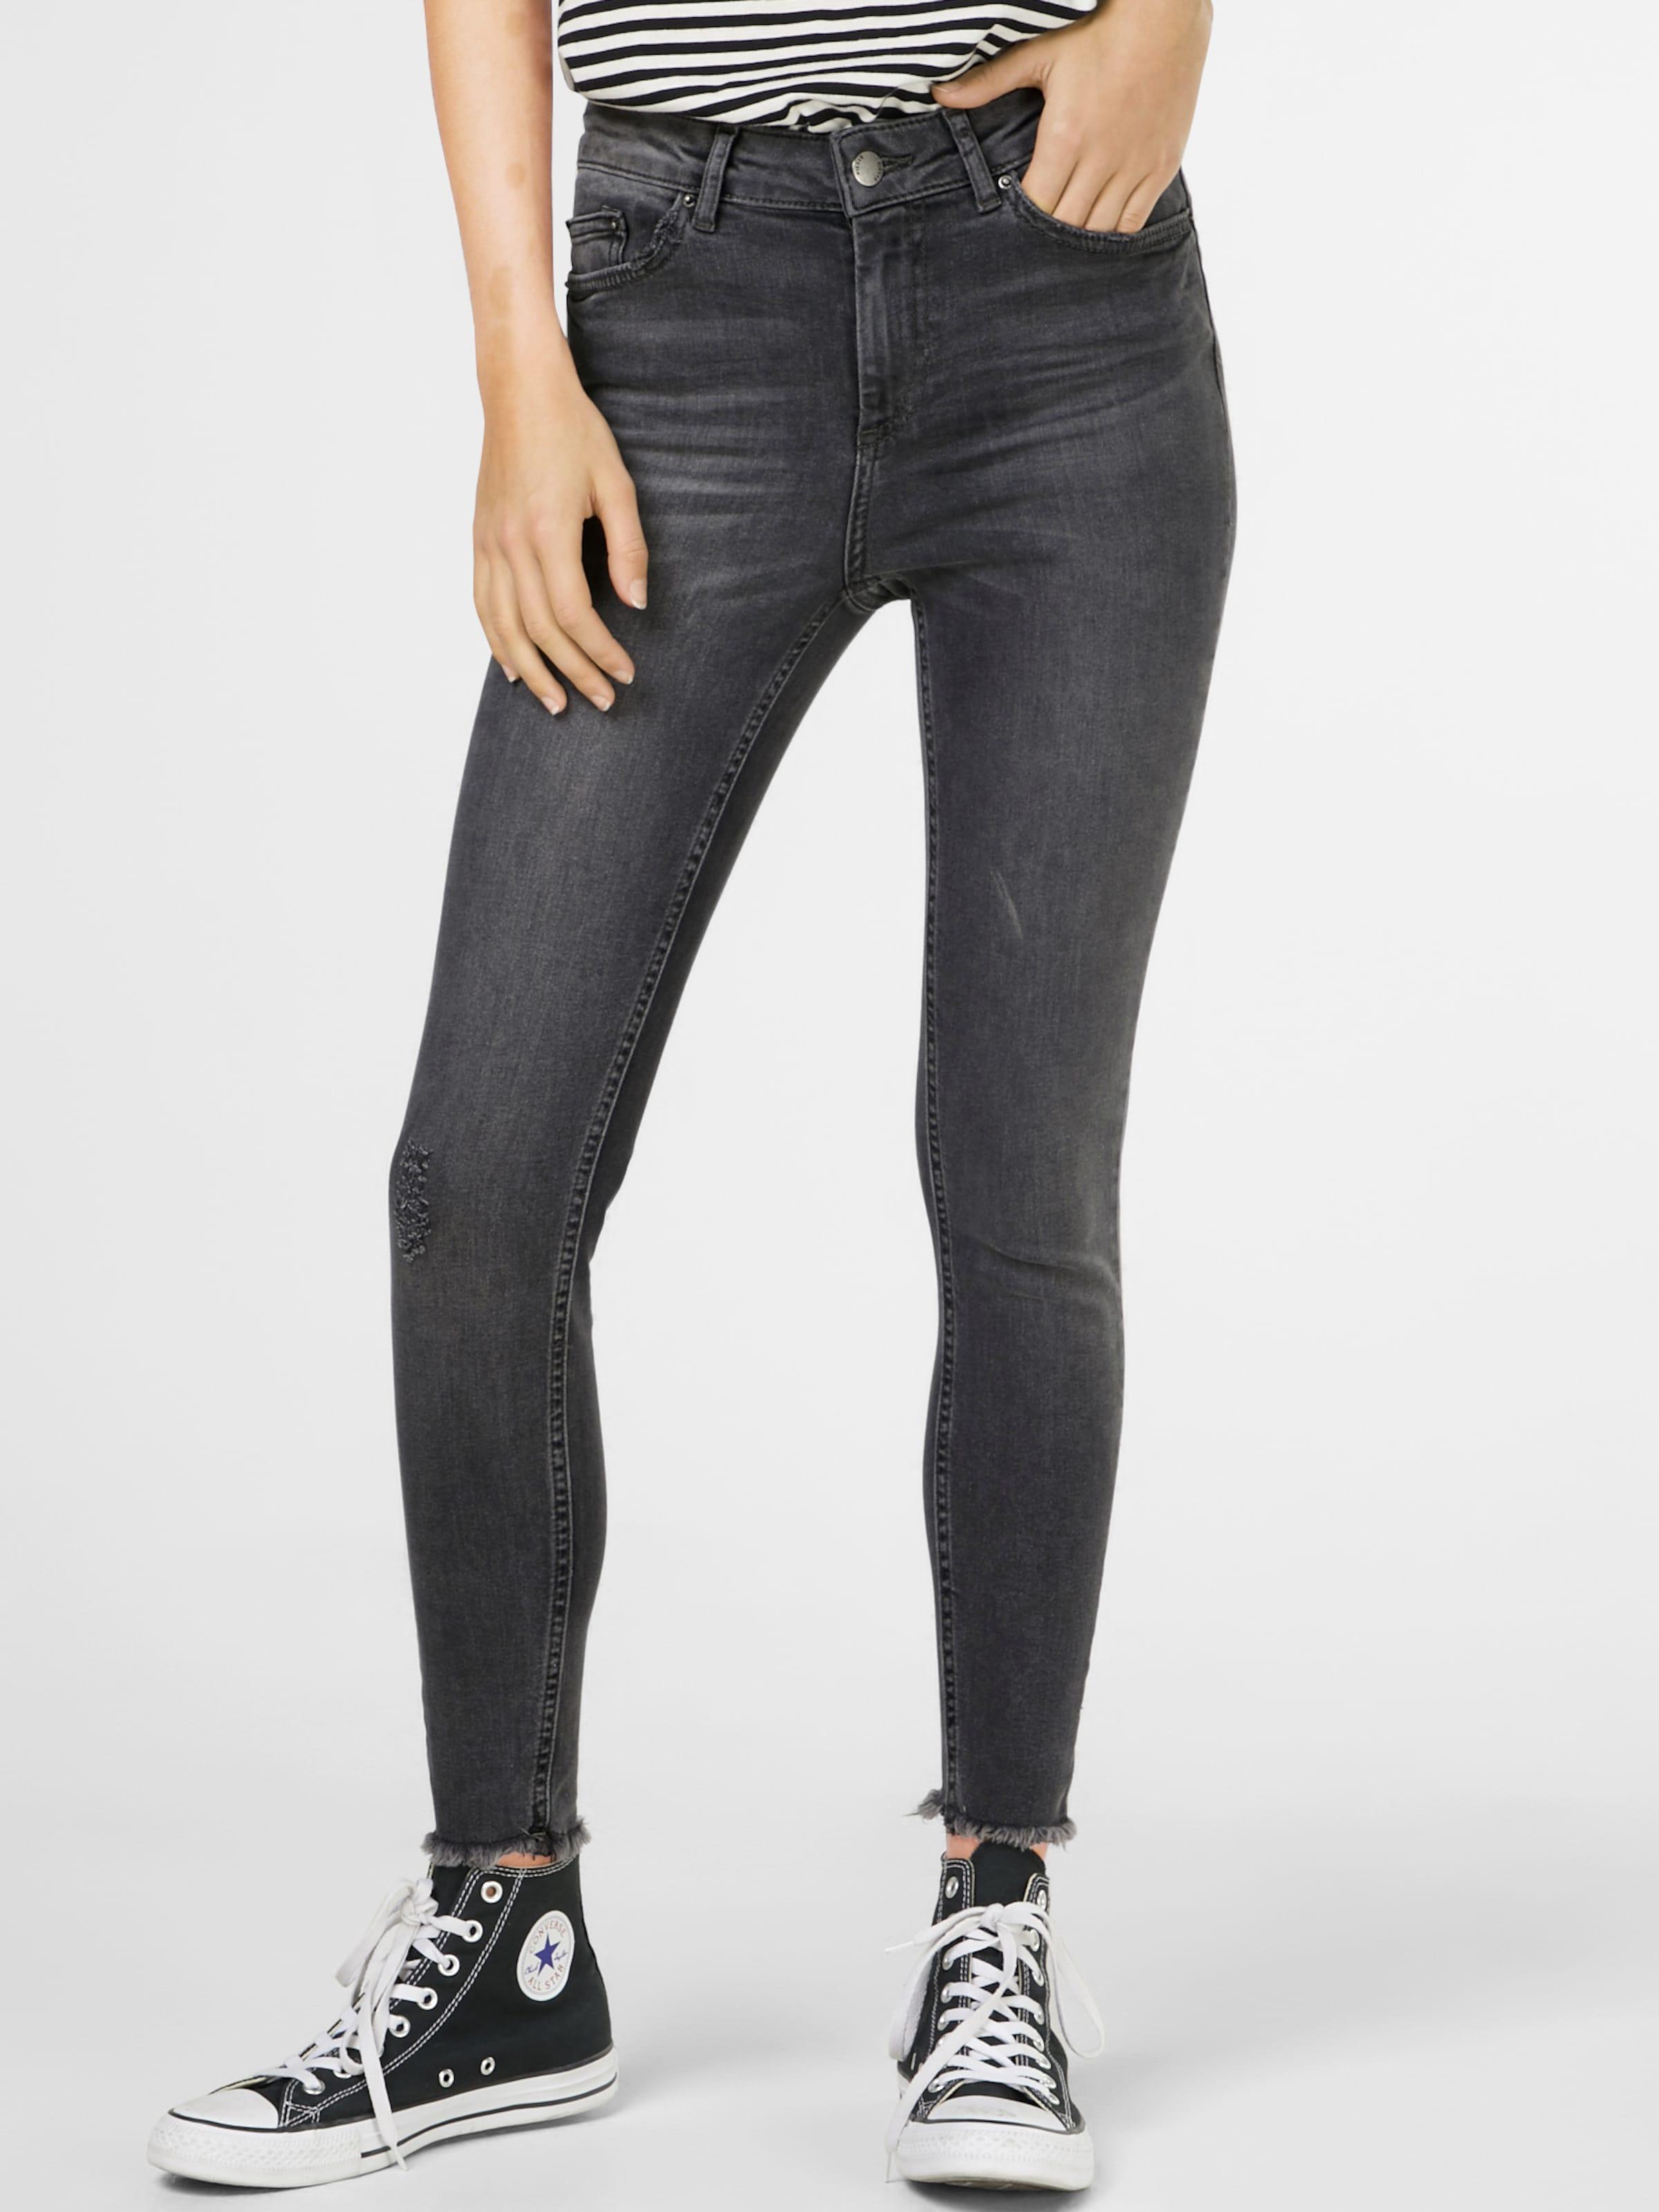 In Jeans Jeans In Denim Jeans Pieces Grey Pieces Grey In Pieces Denim 354RcLAjSq